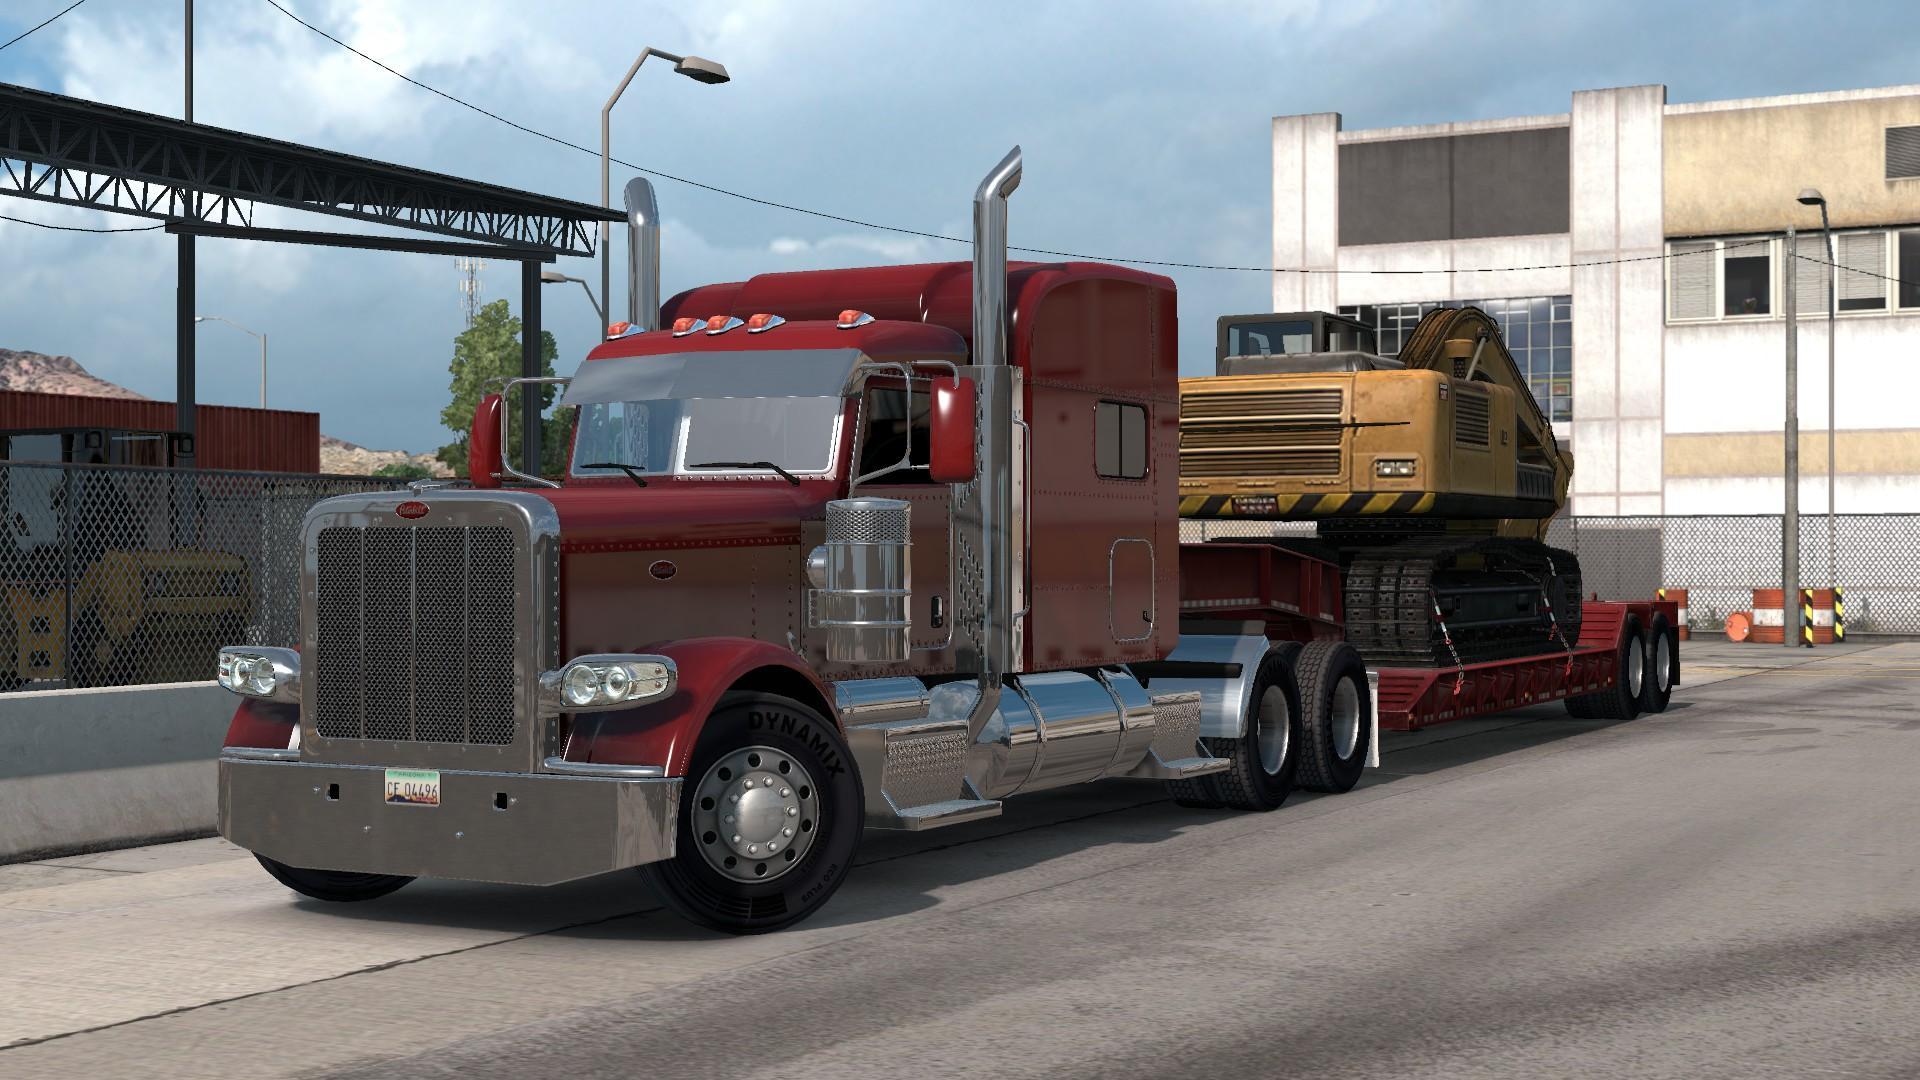 Seat Skins For Trucks >> Peterbilt 389 interior/exterior rework v1.0 - Modhub.us